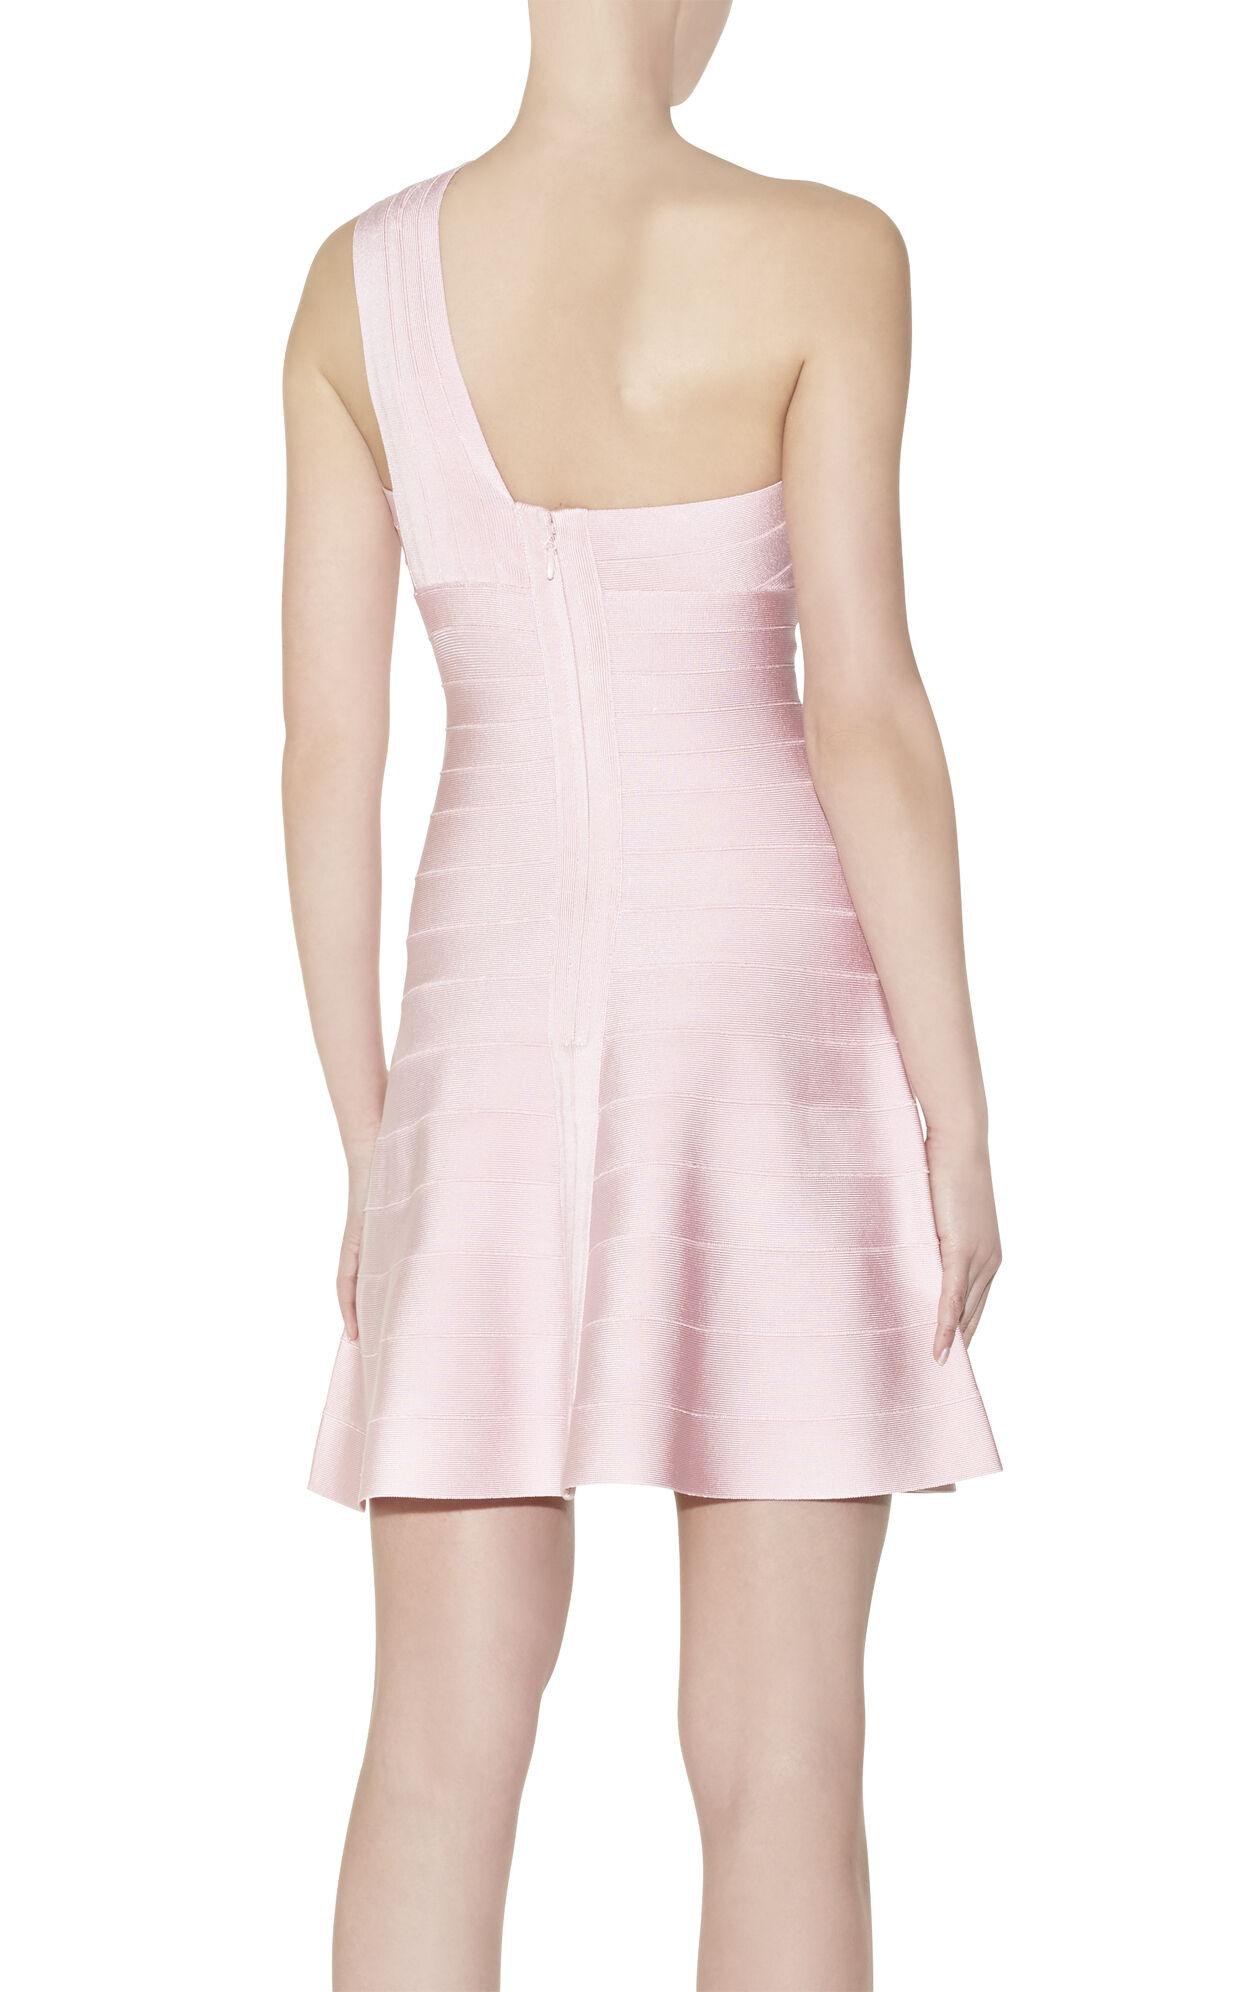 Sydney One-Shoulder Bandage Dress